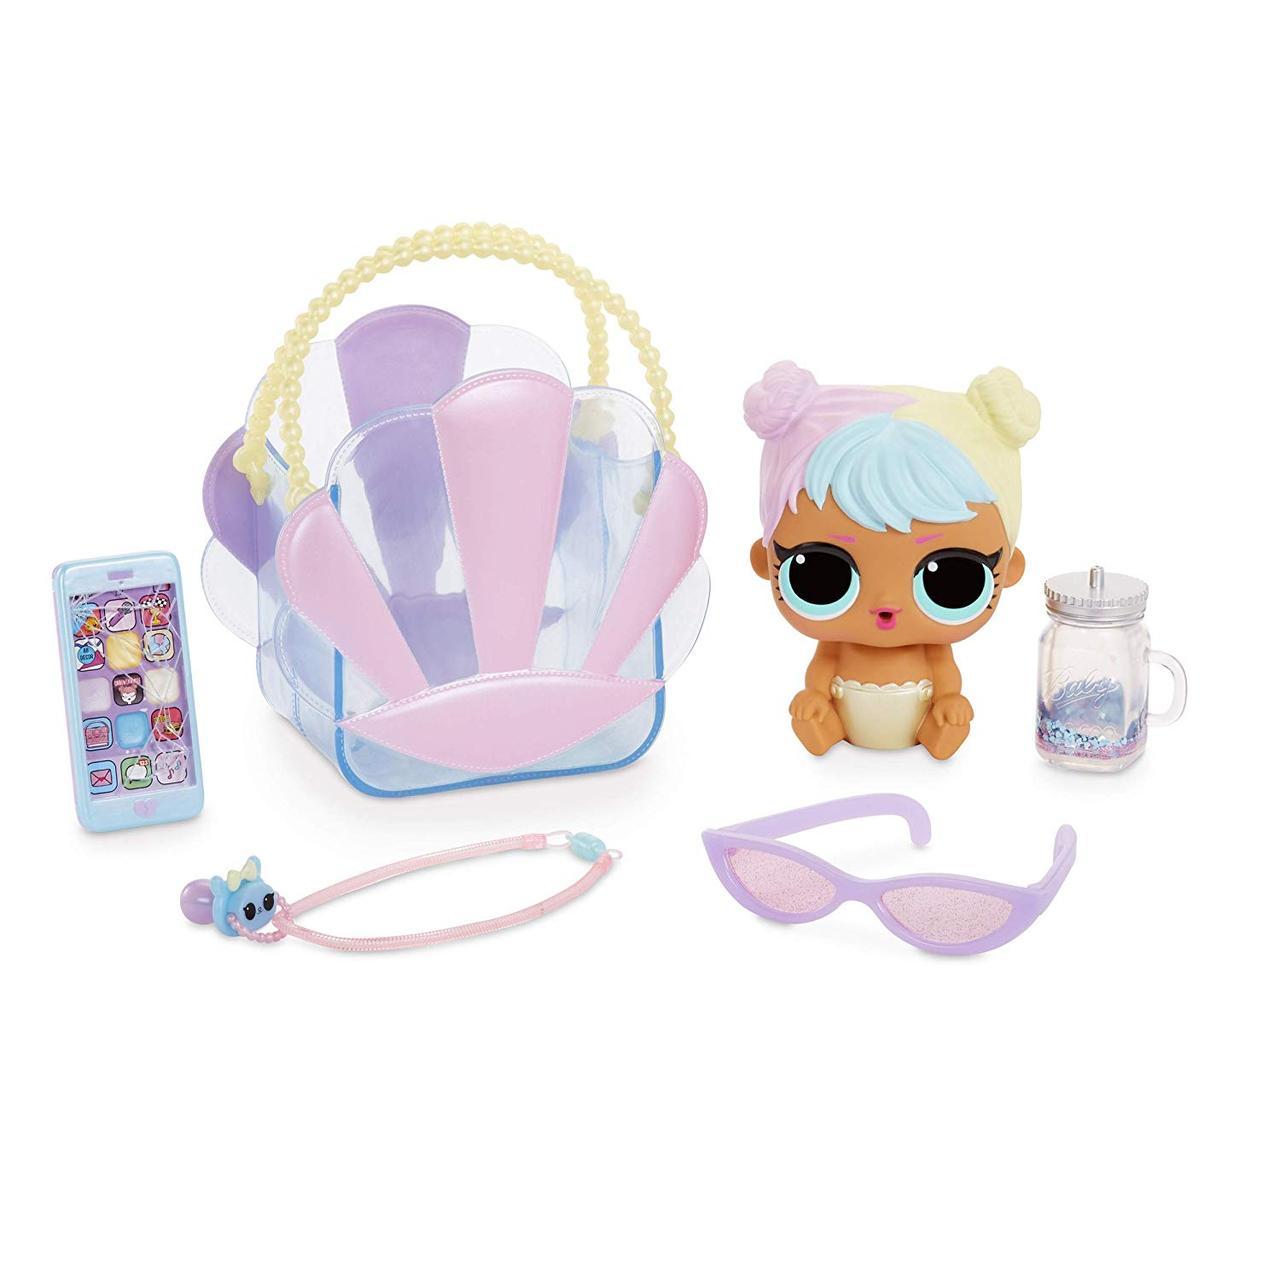 Кукла L.O.L. Surprise! Ooh La La Baby Surprise- Lil Bon Bon Бейби Бон Бон MGA Оригинал